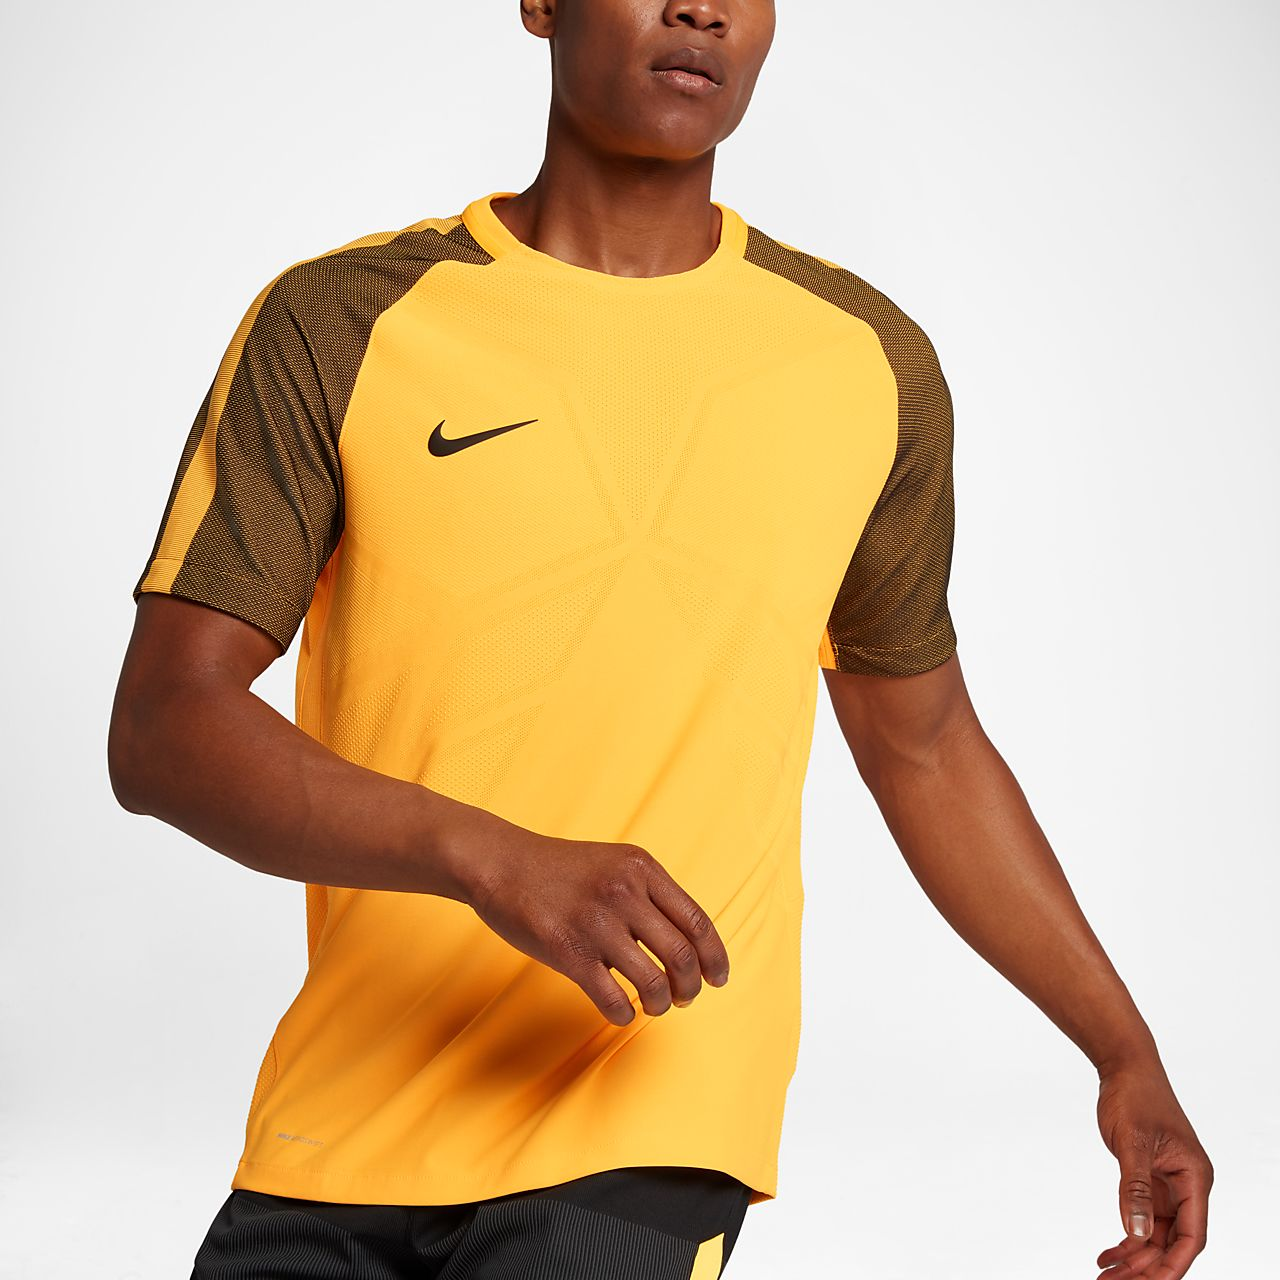 8d9d0822 Nike Strike AeroSwift Strike Men's Short-Sleeve Football Top. Nike ...